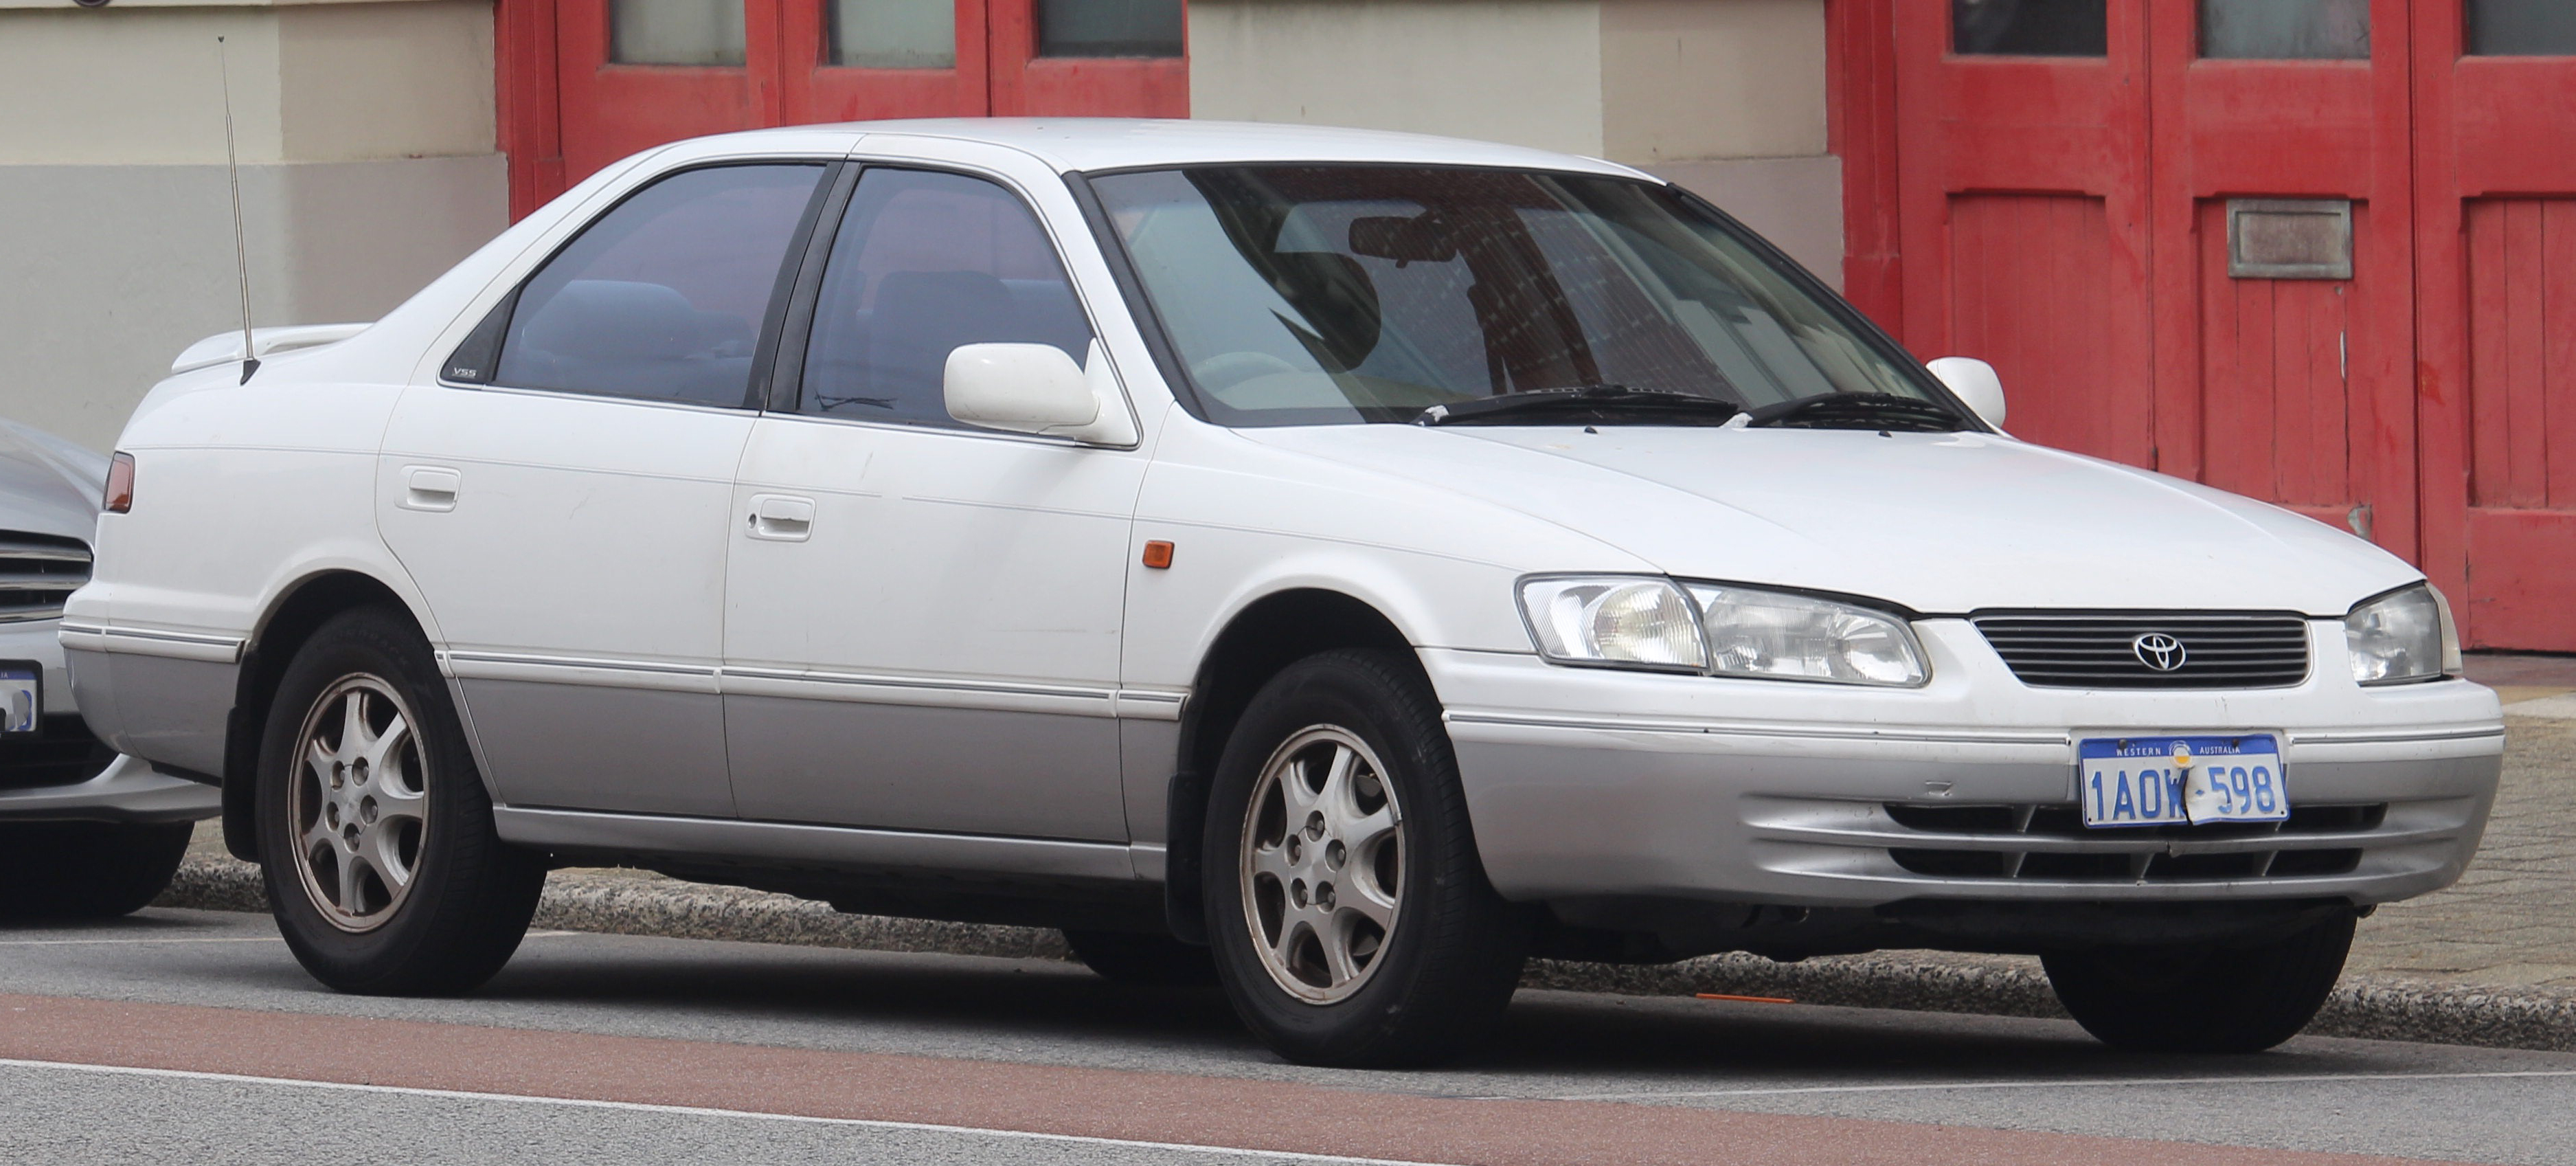 Toyota Camry (XV20) - Wikipedia